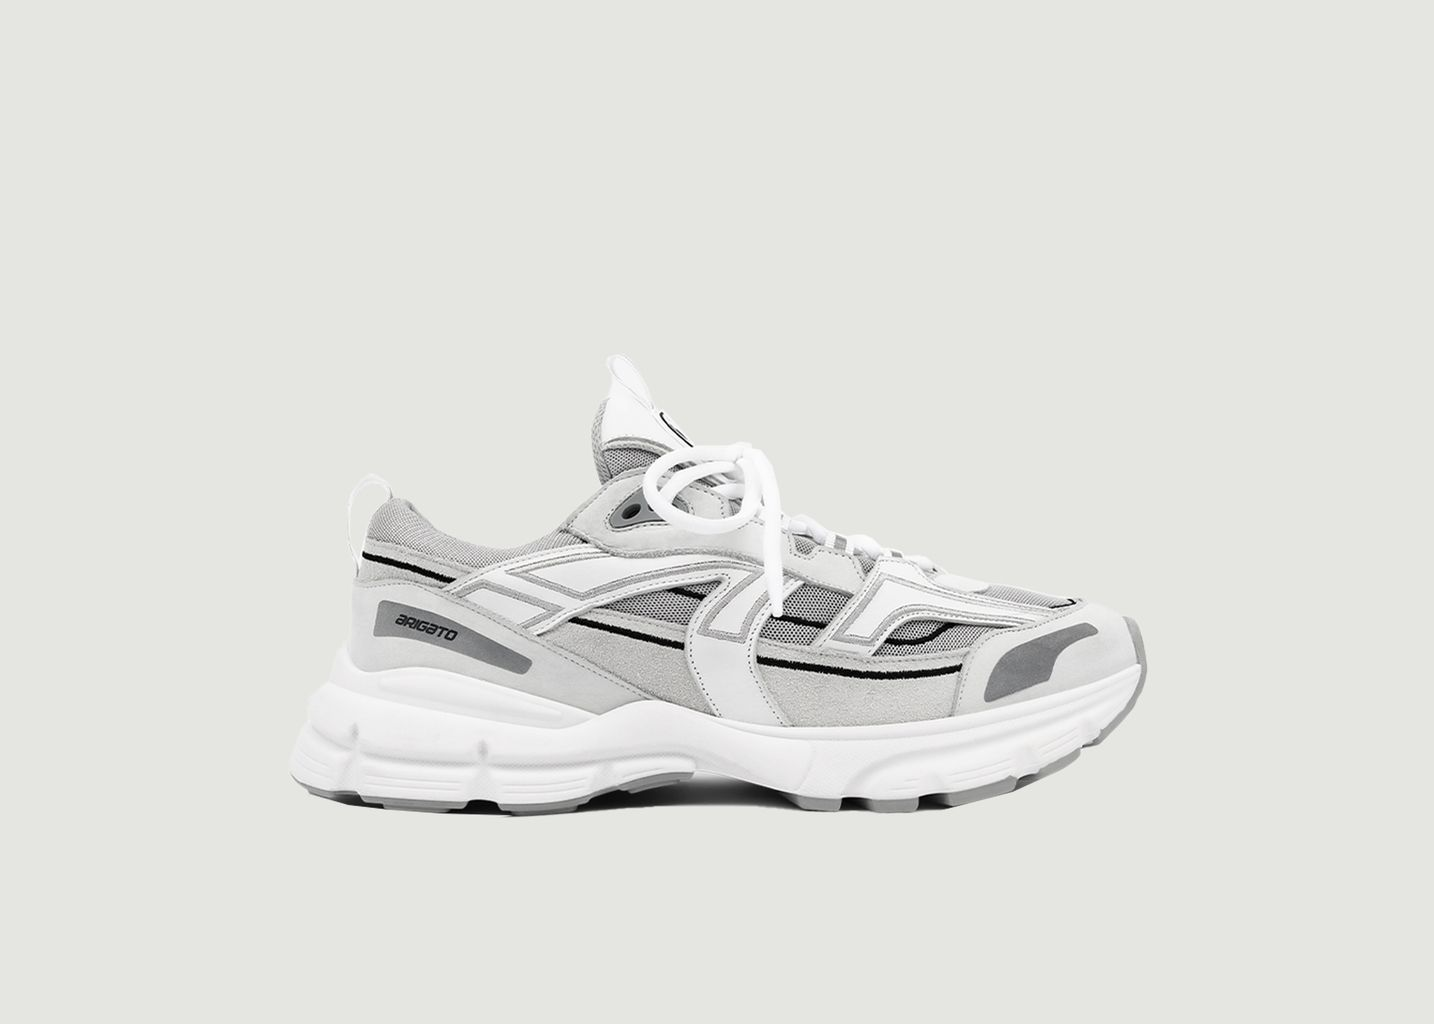 Sneakers Marathon R-Trail - Axel Arigato